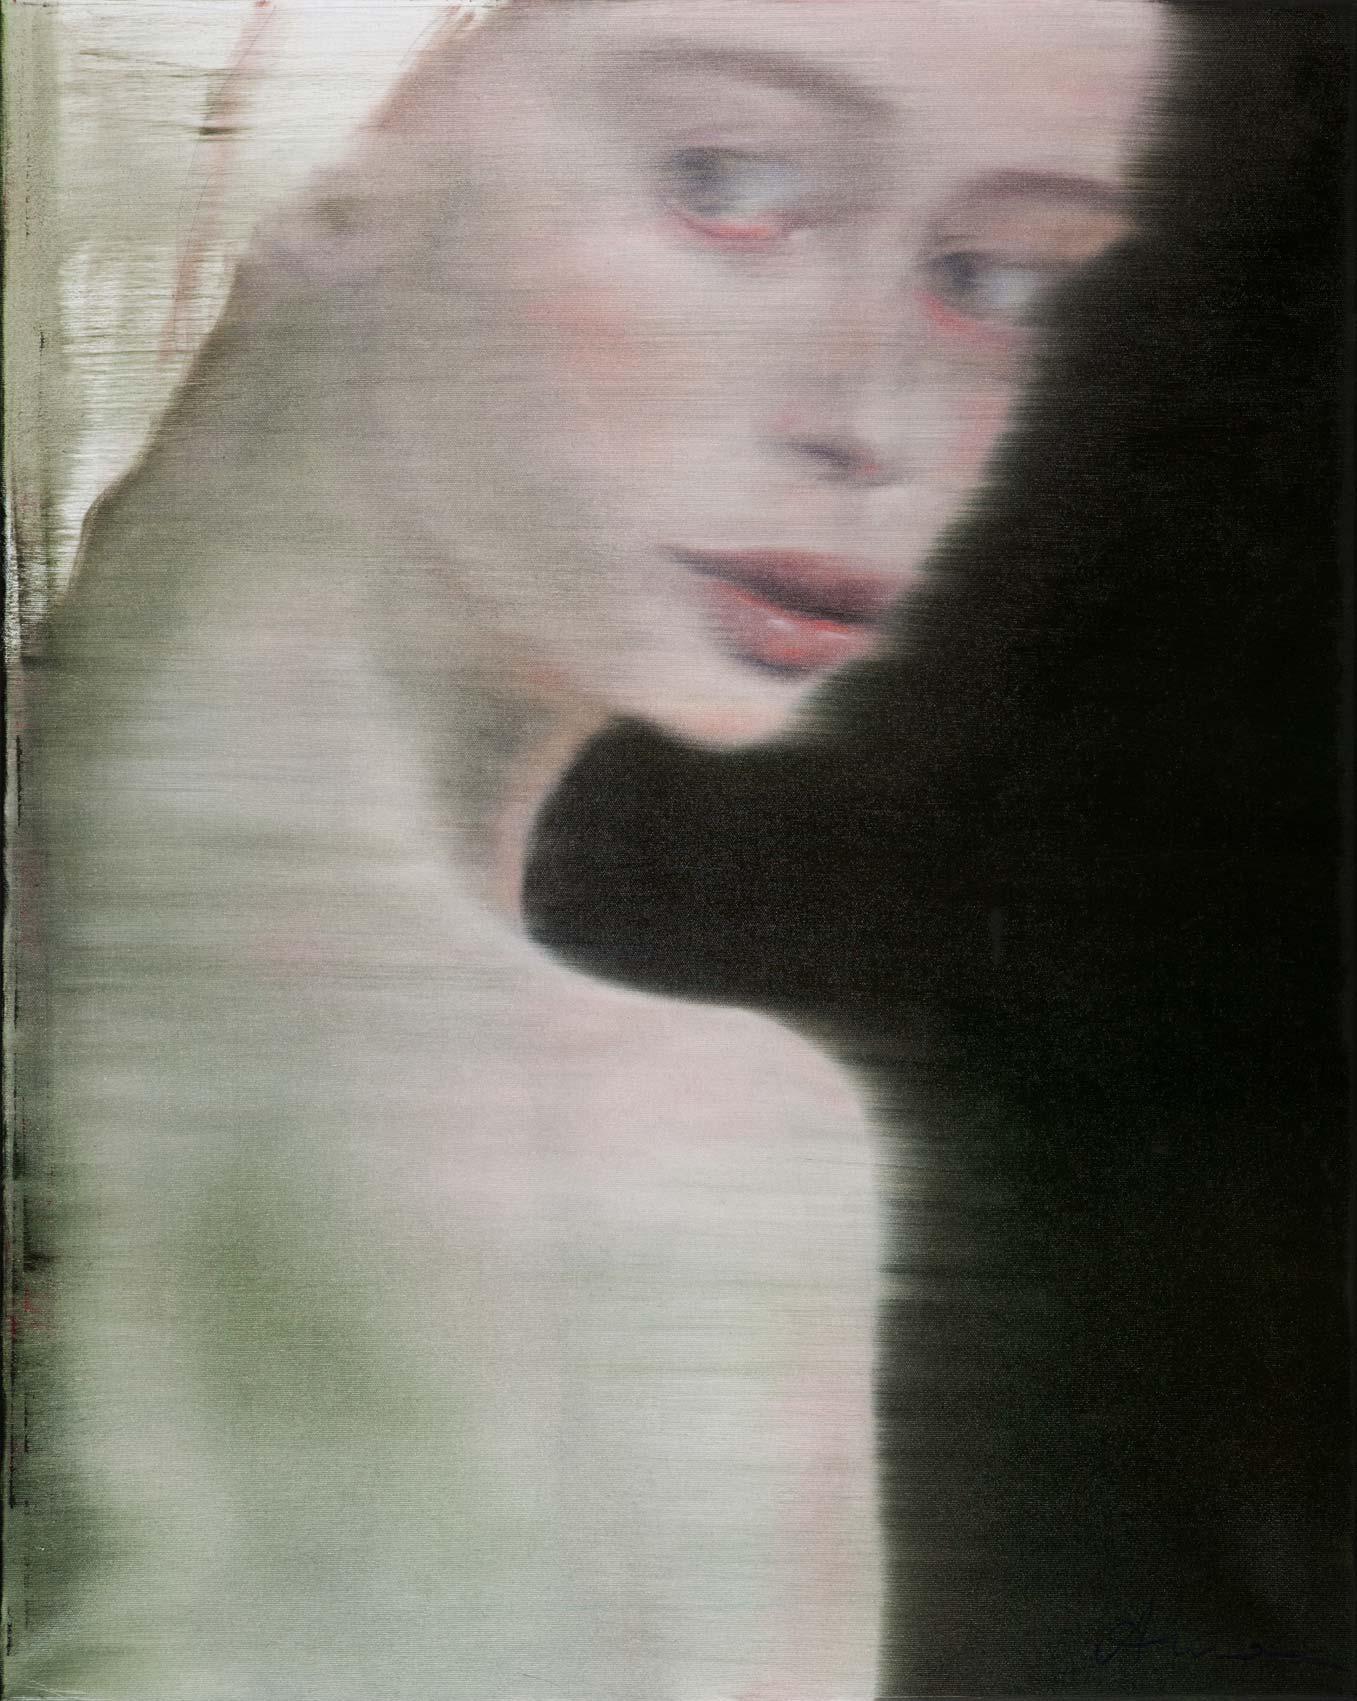 Silke Aurora, Layers of sensation, oil on canvas, 100 x 80 cm